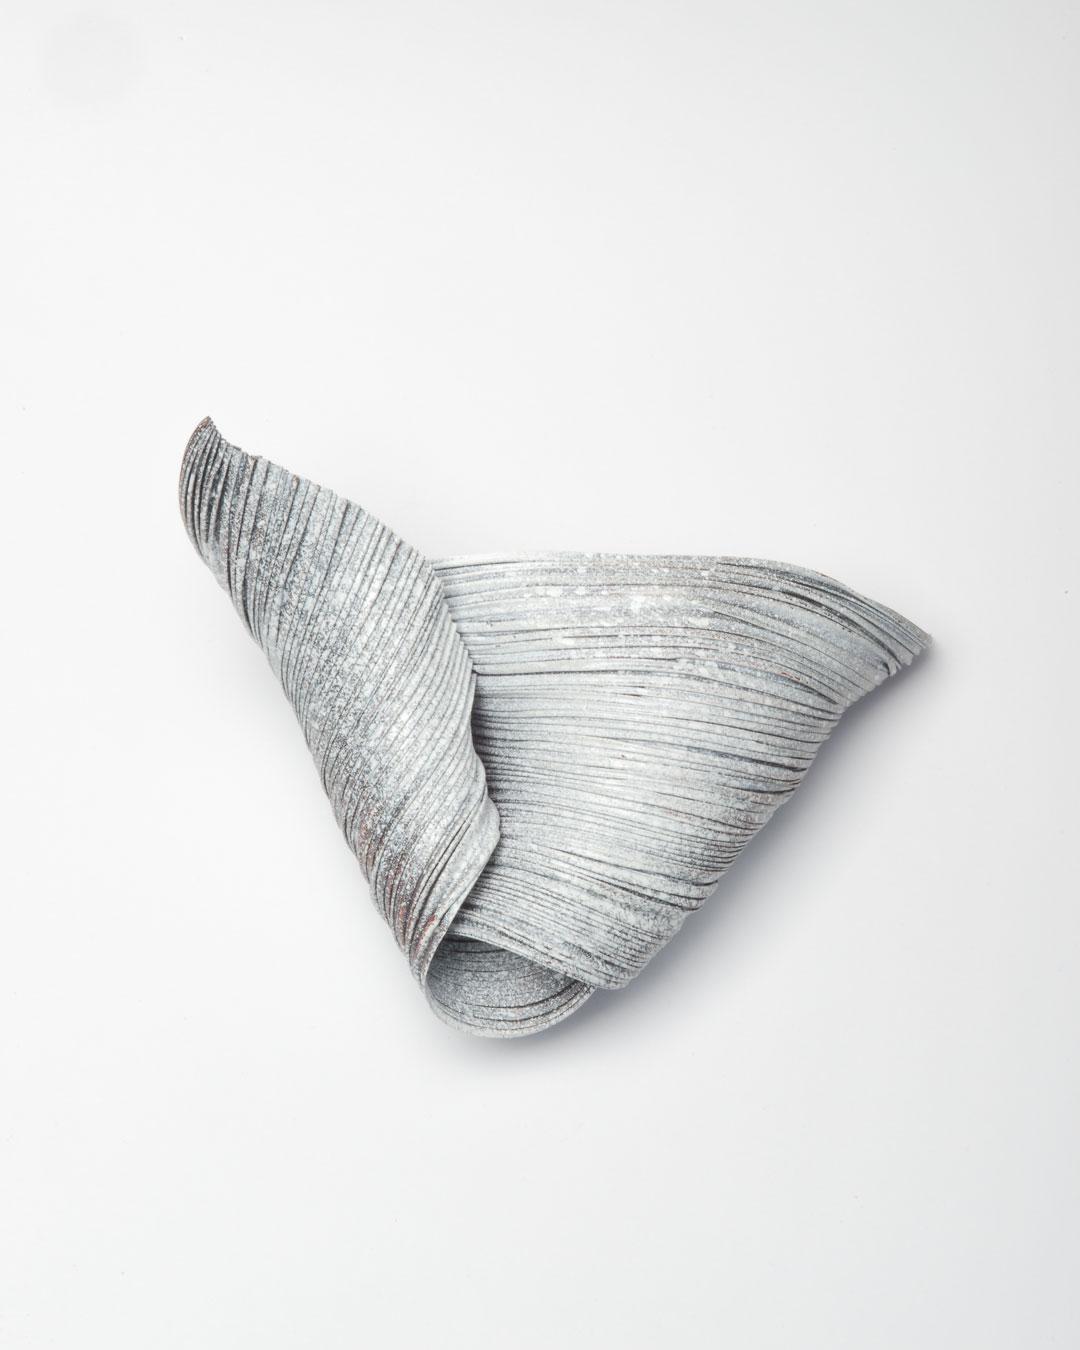 Li Liang, Nr. 2: Line, 2018, brooch; copper, 100 x 140 x 50 mm, €1650